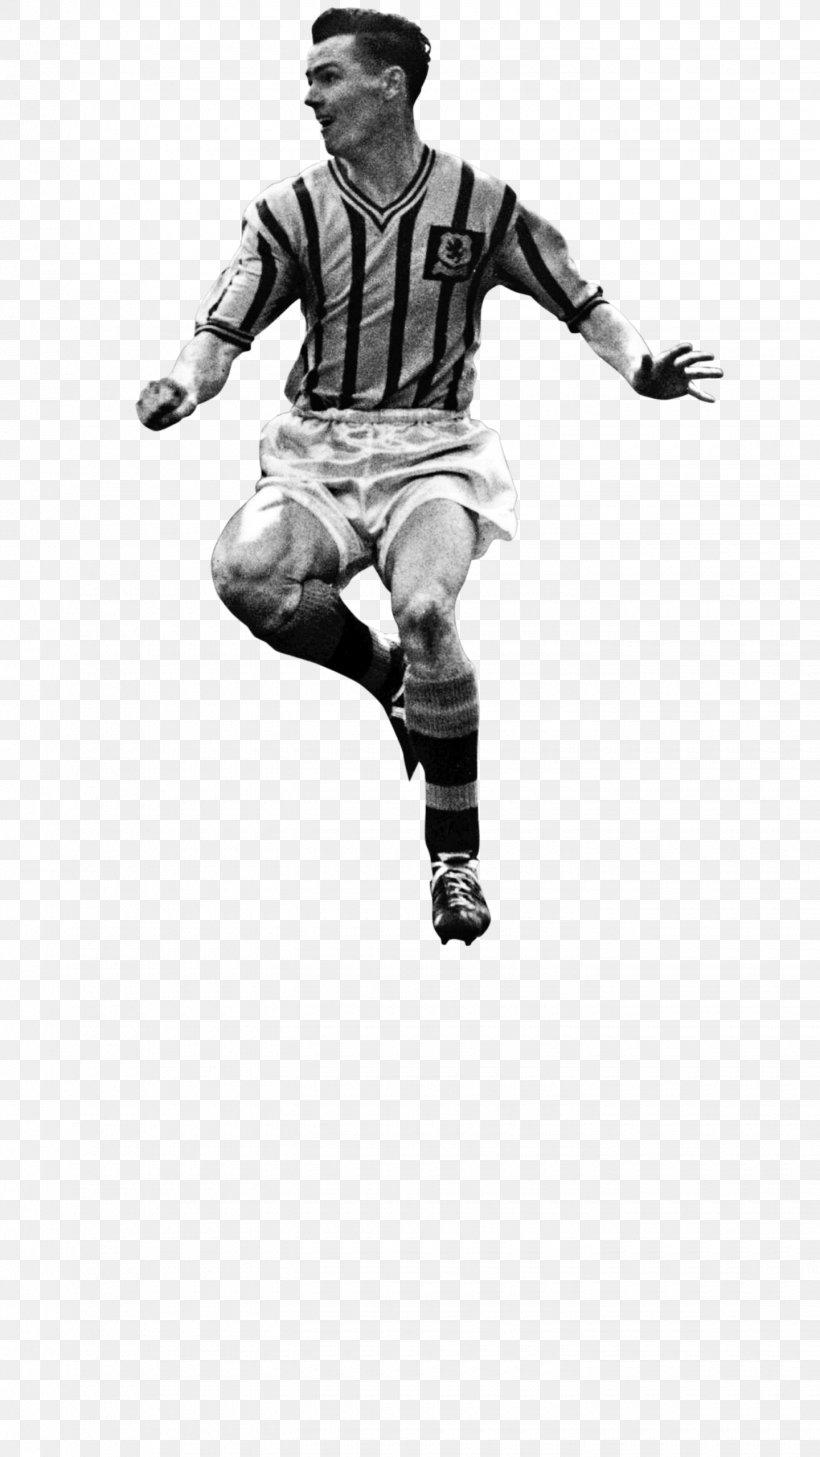 Aston Villa F C 1957 Fa Cup Final Football Player Northern Ireland National Football Team Png 1440x2560px